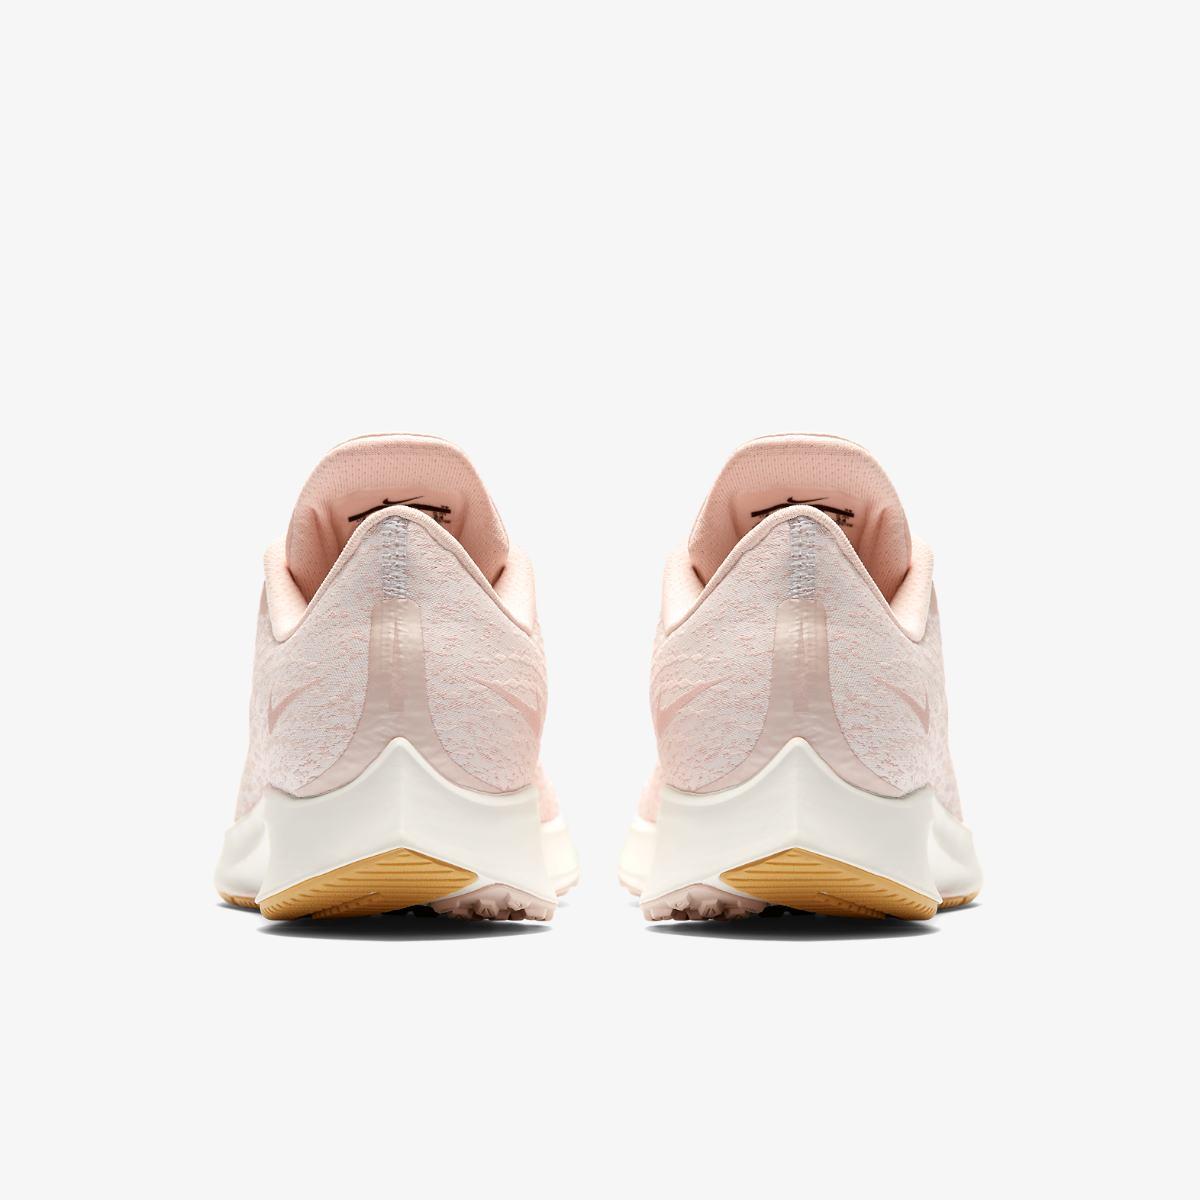 new product 0eaa5 303de Кроссовки для бега Nike W AIR ZOOM PEGASUS 35 PRM AH8392-800 ...